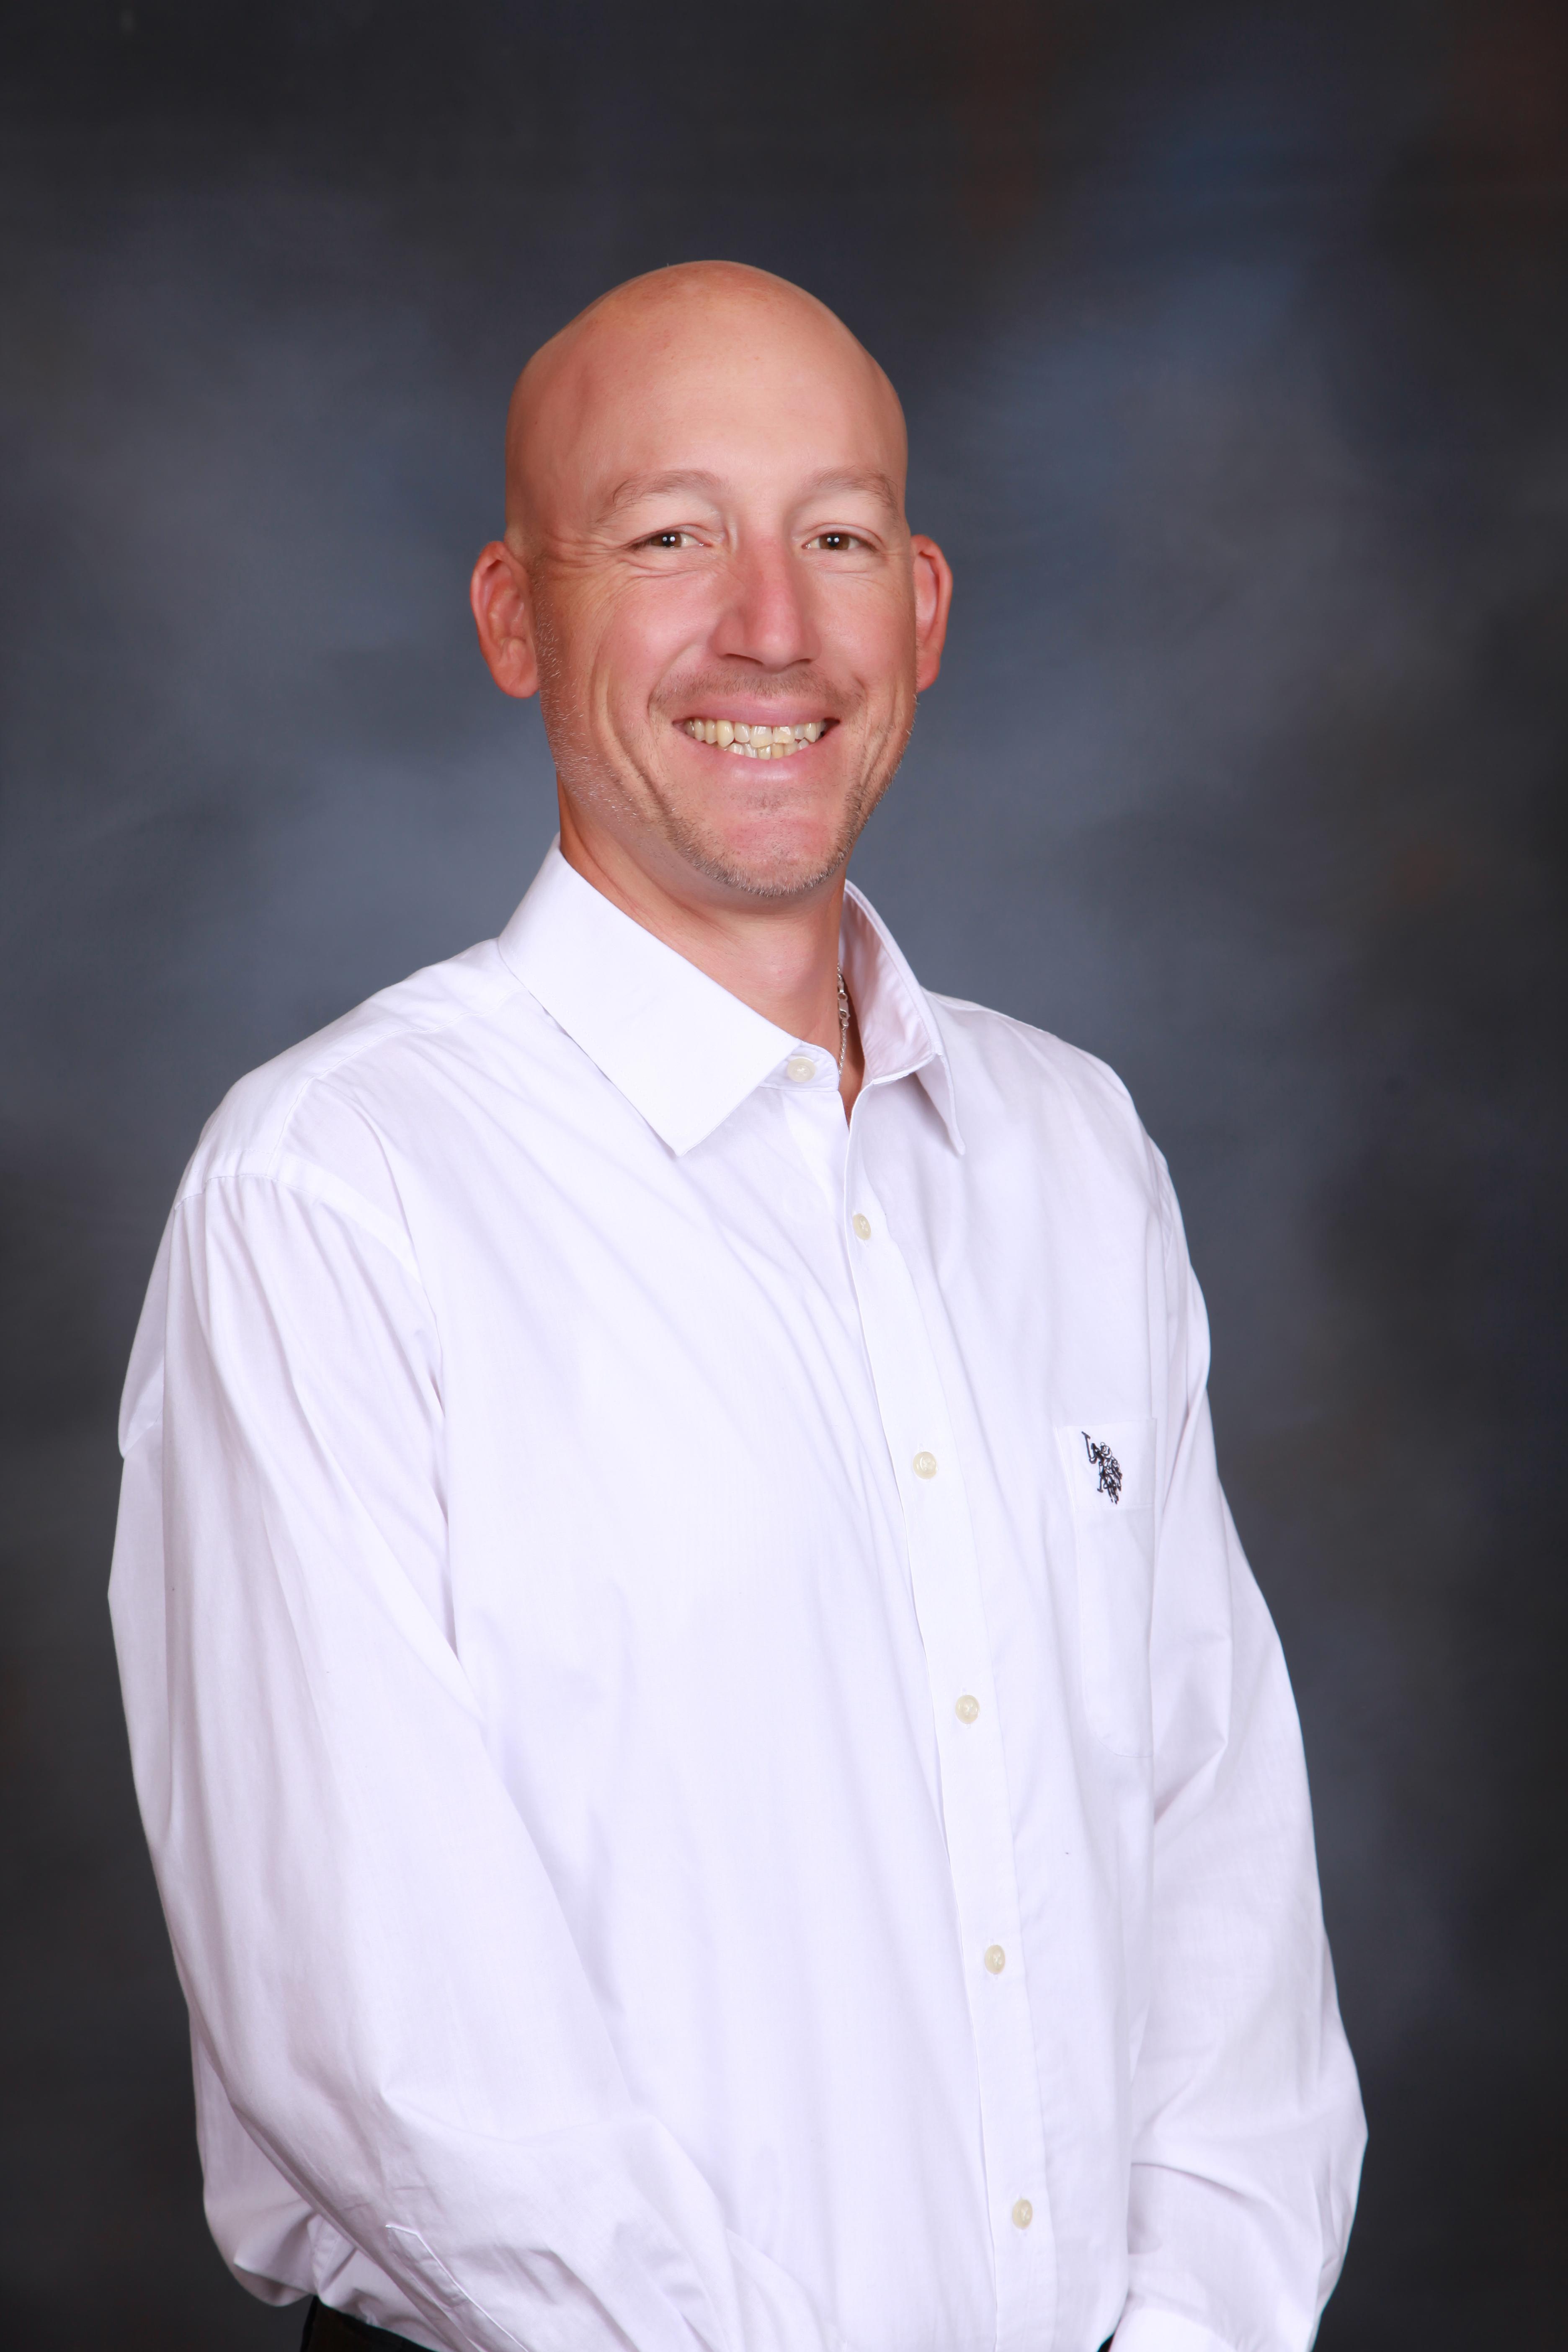 Mr.Stossel